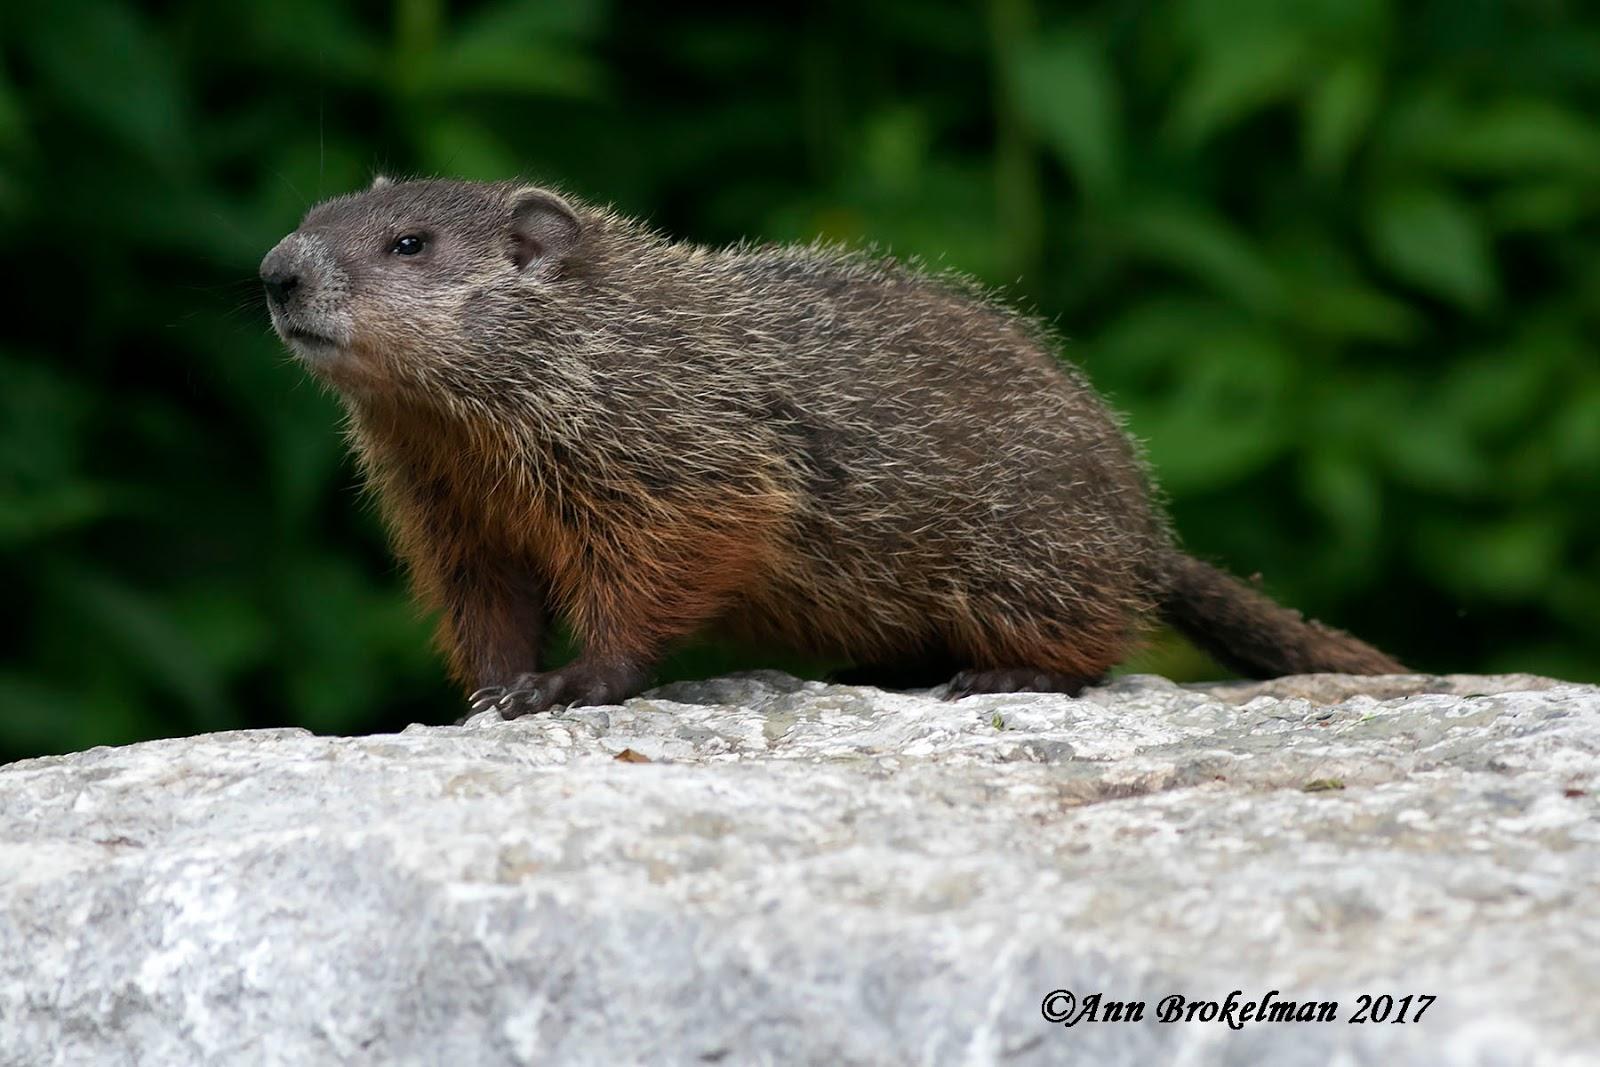 ann brokelman photography groundhog and babies june 2017